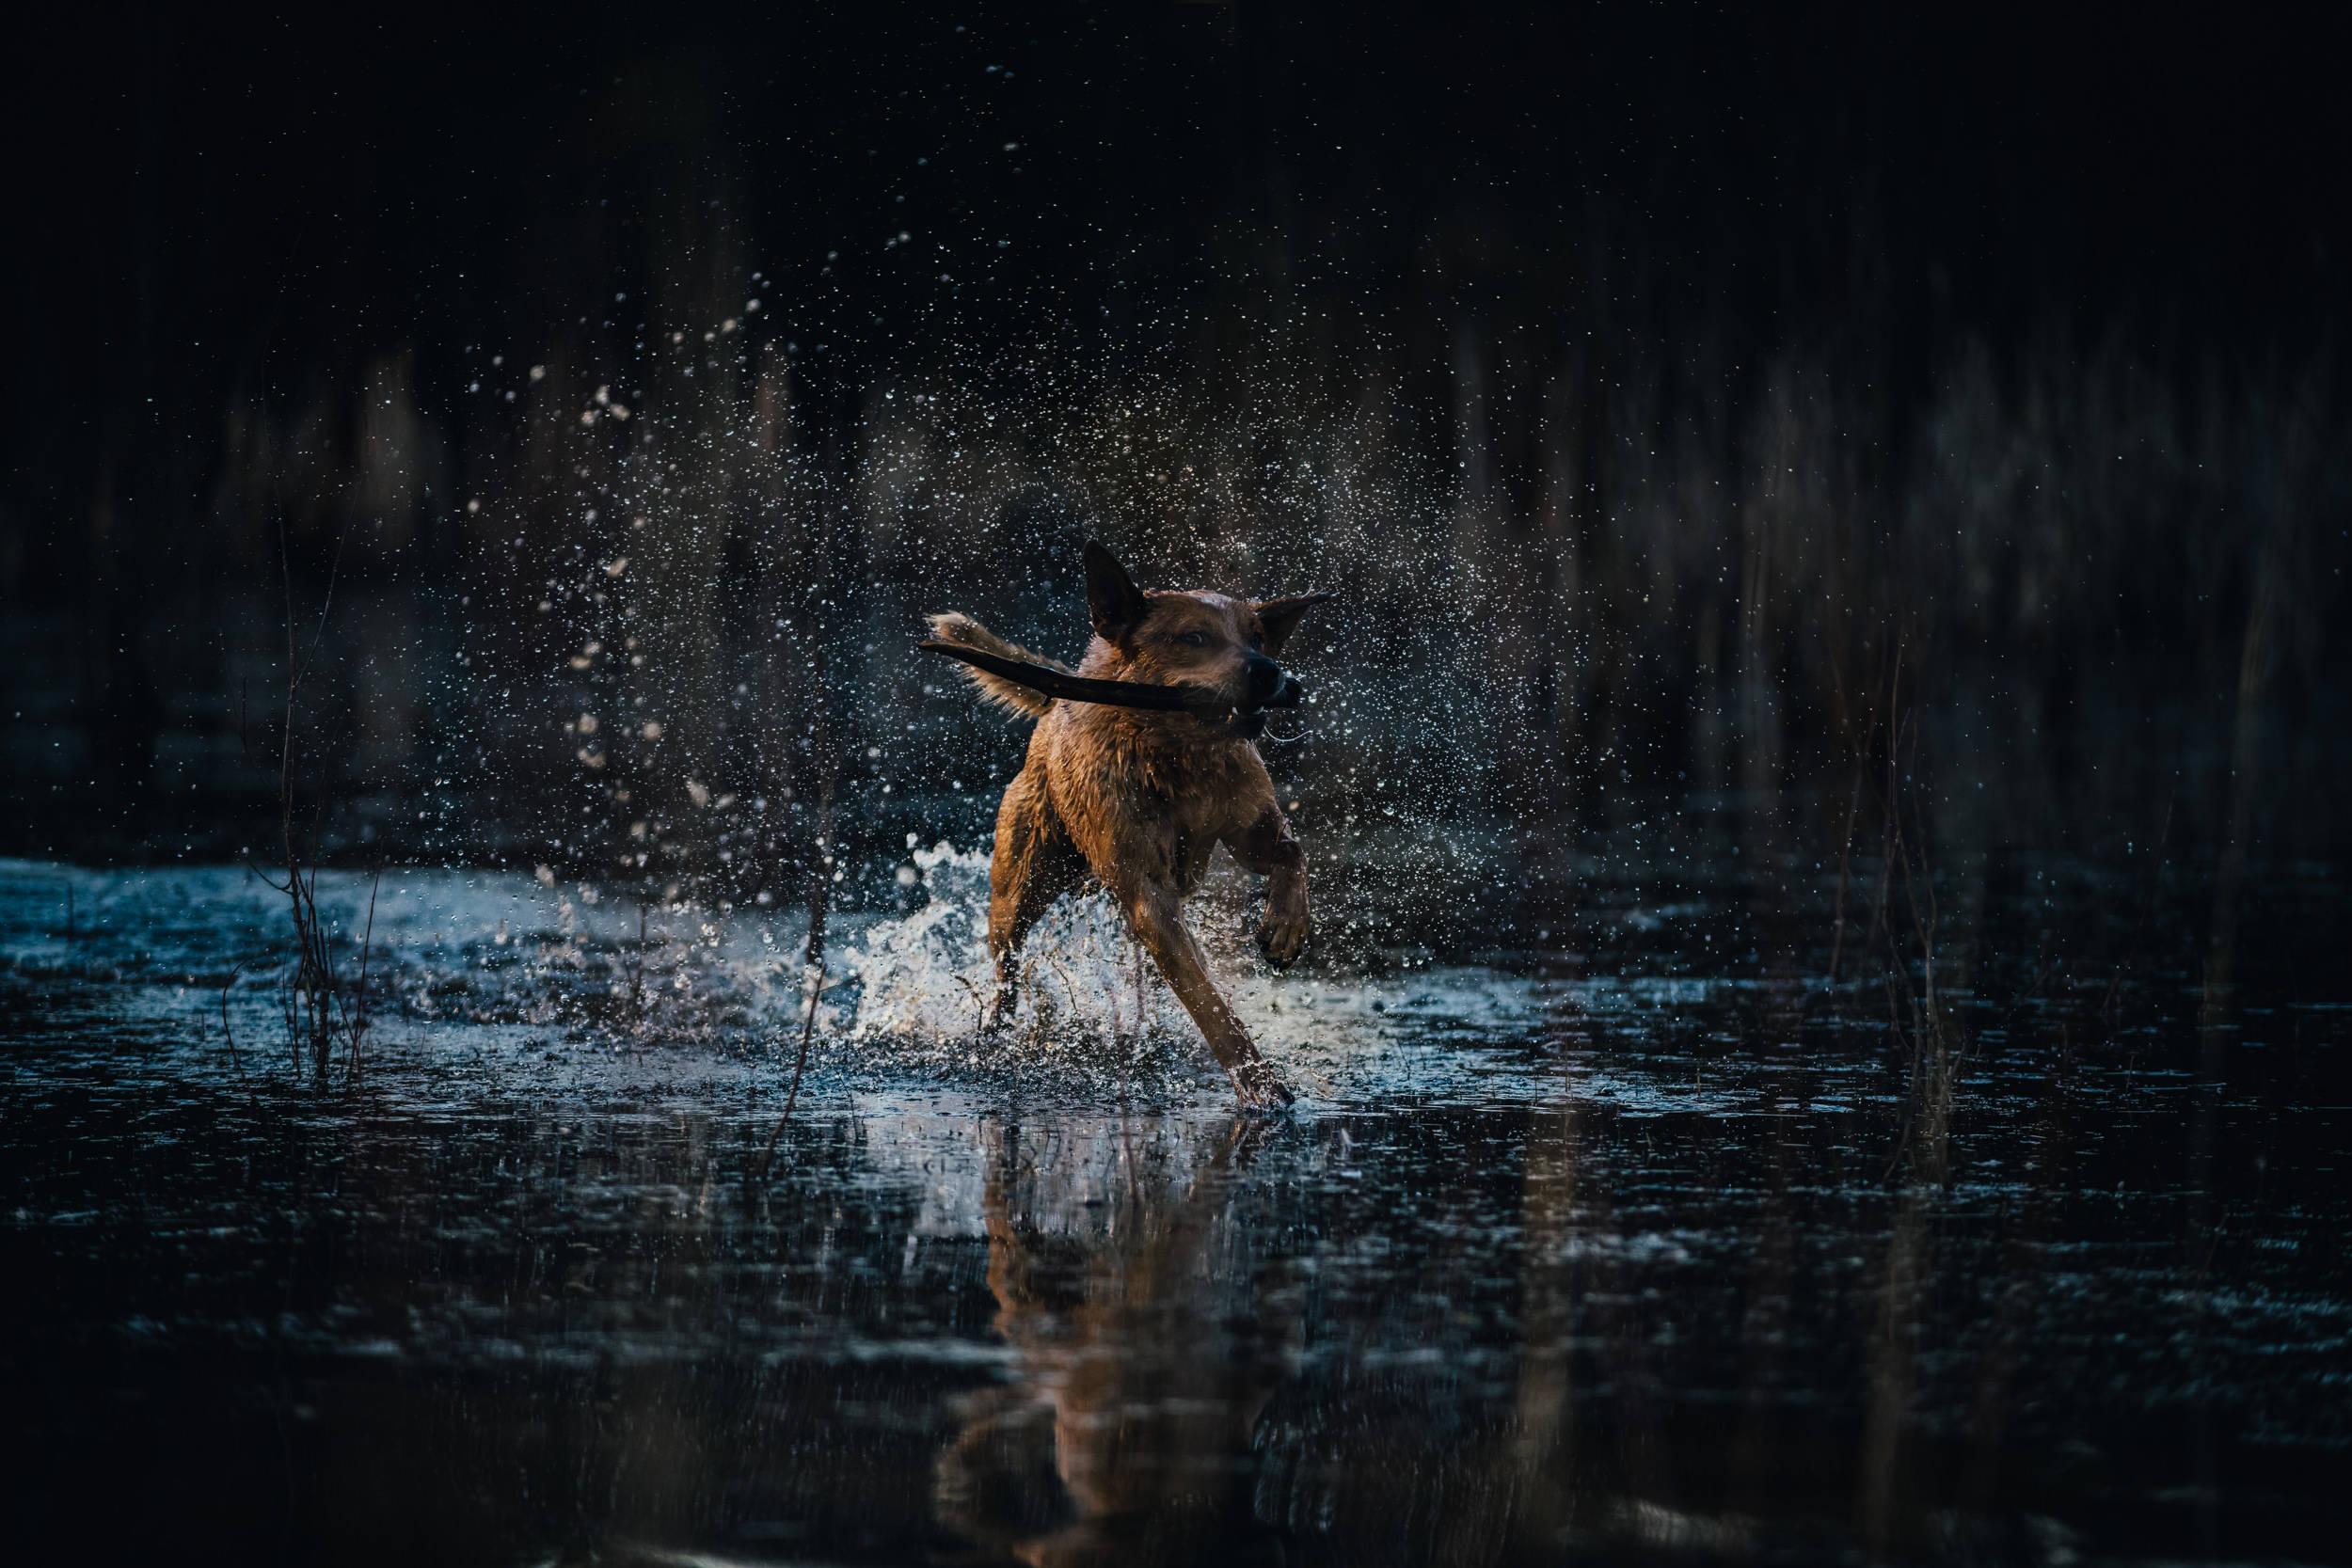 Bill -the water beast-